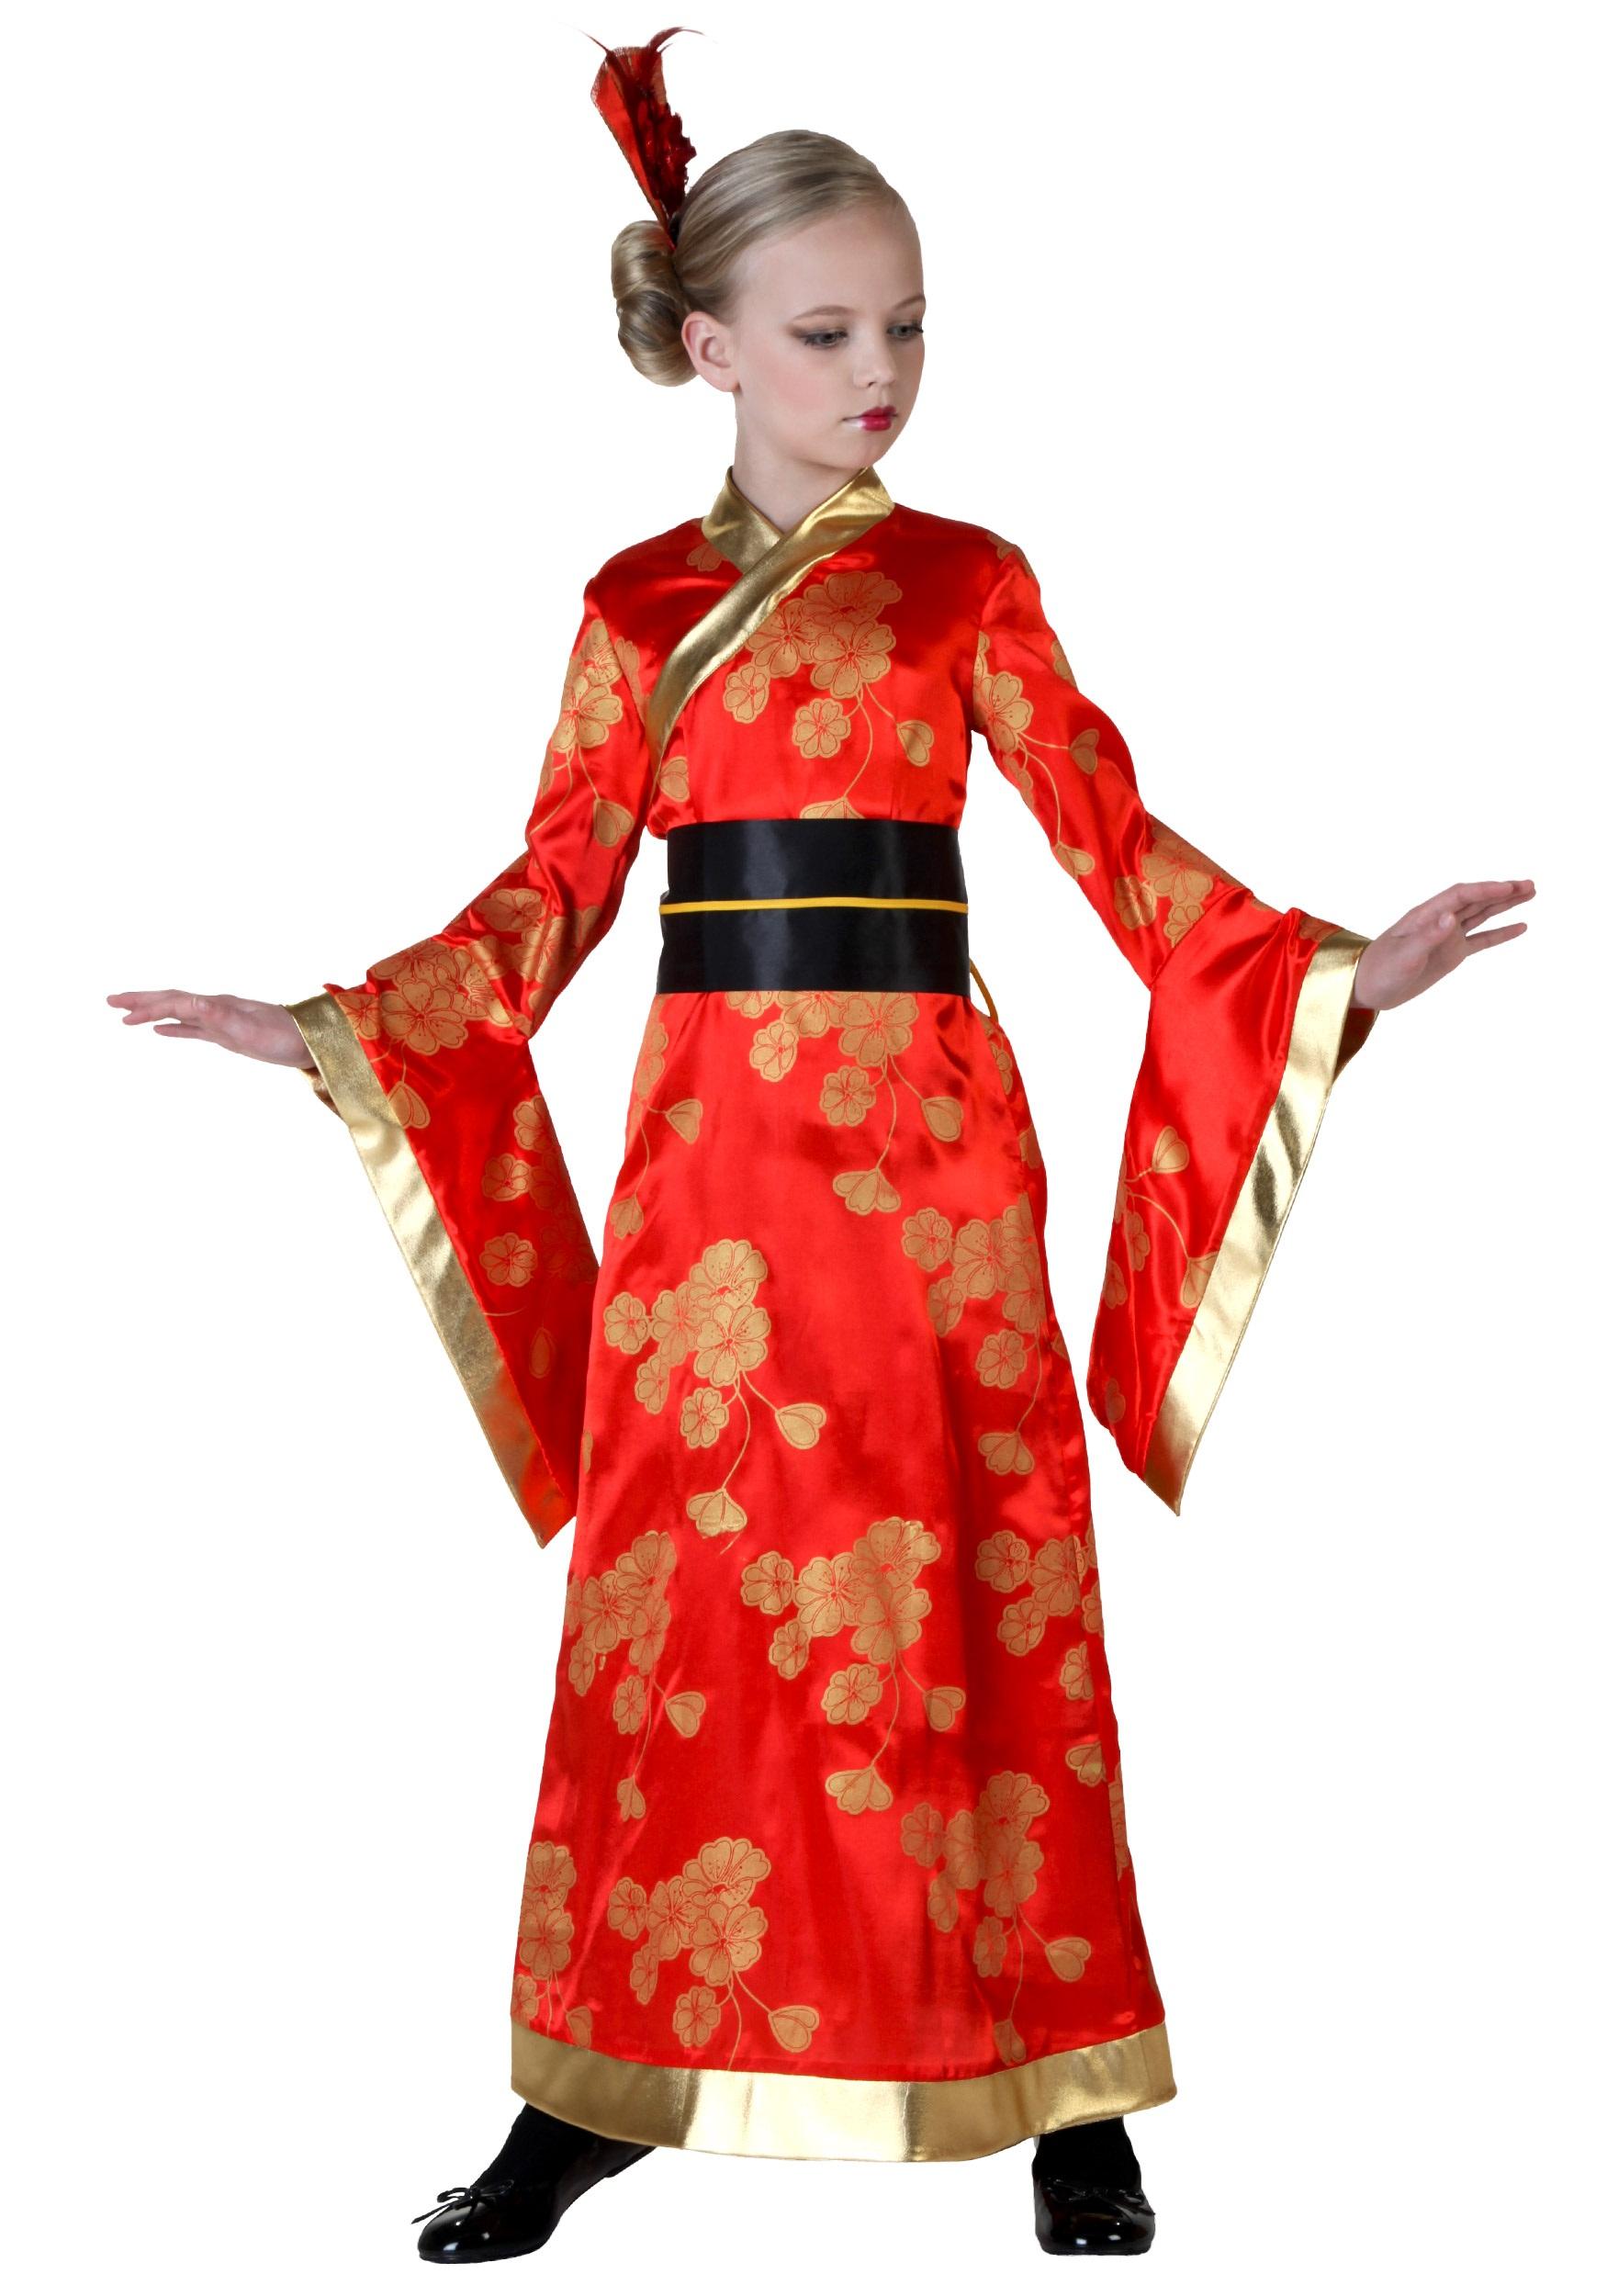 Costume Halloween Geisha.Child Geisha Costume Halloween Costume Ideas 2019